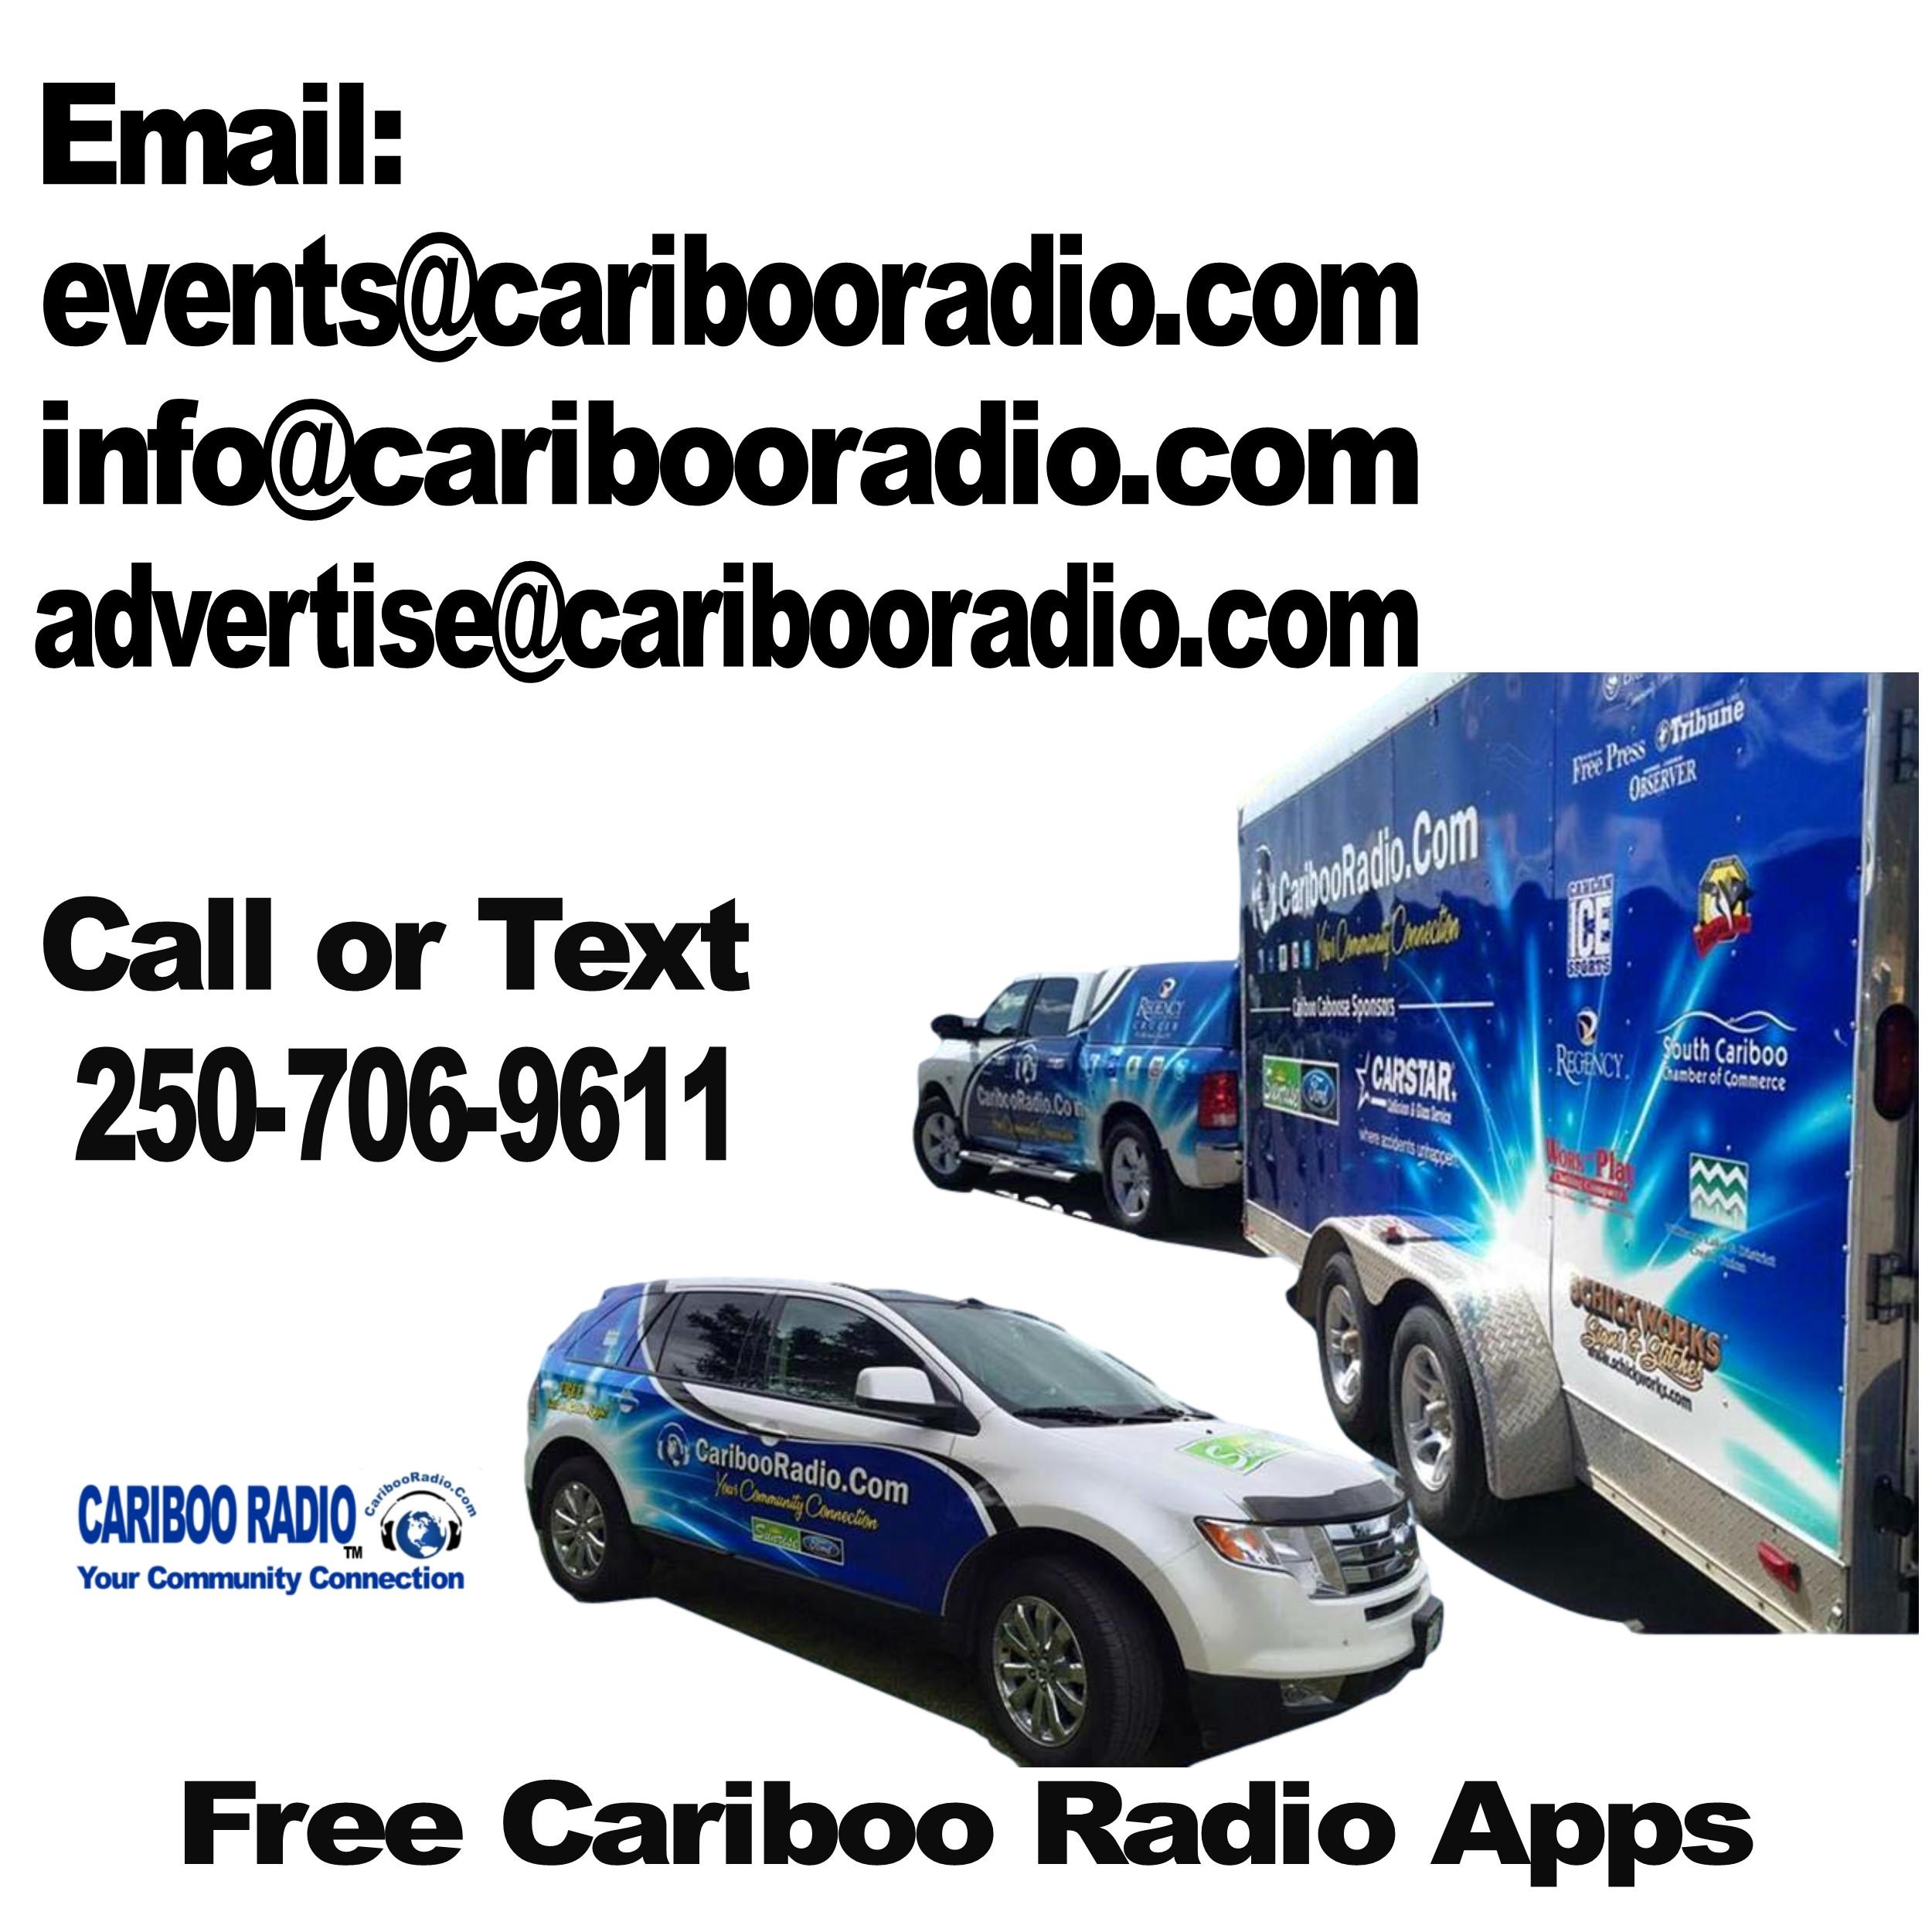 Cariboo-Radio-Web-Poster-Boost